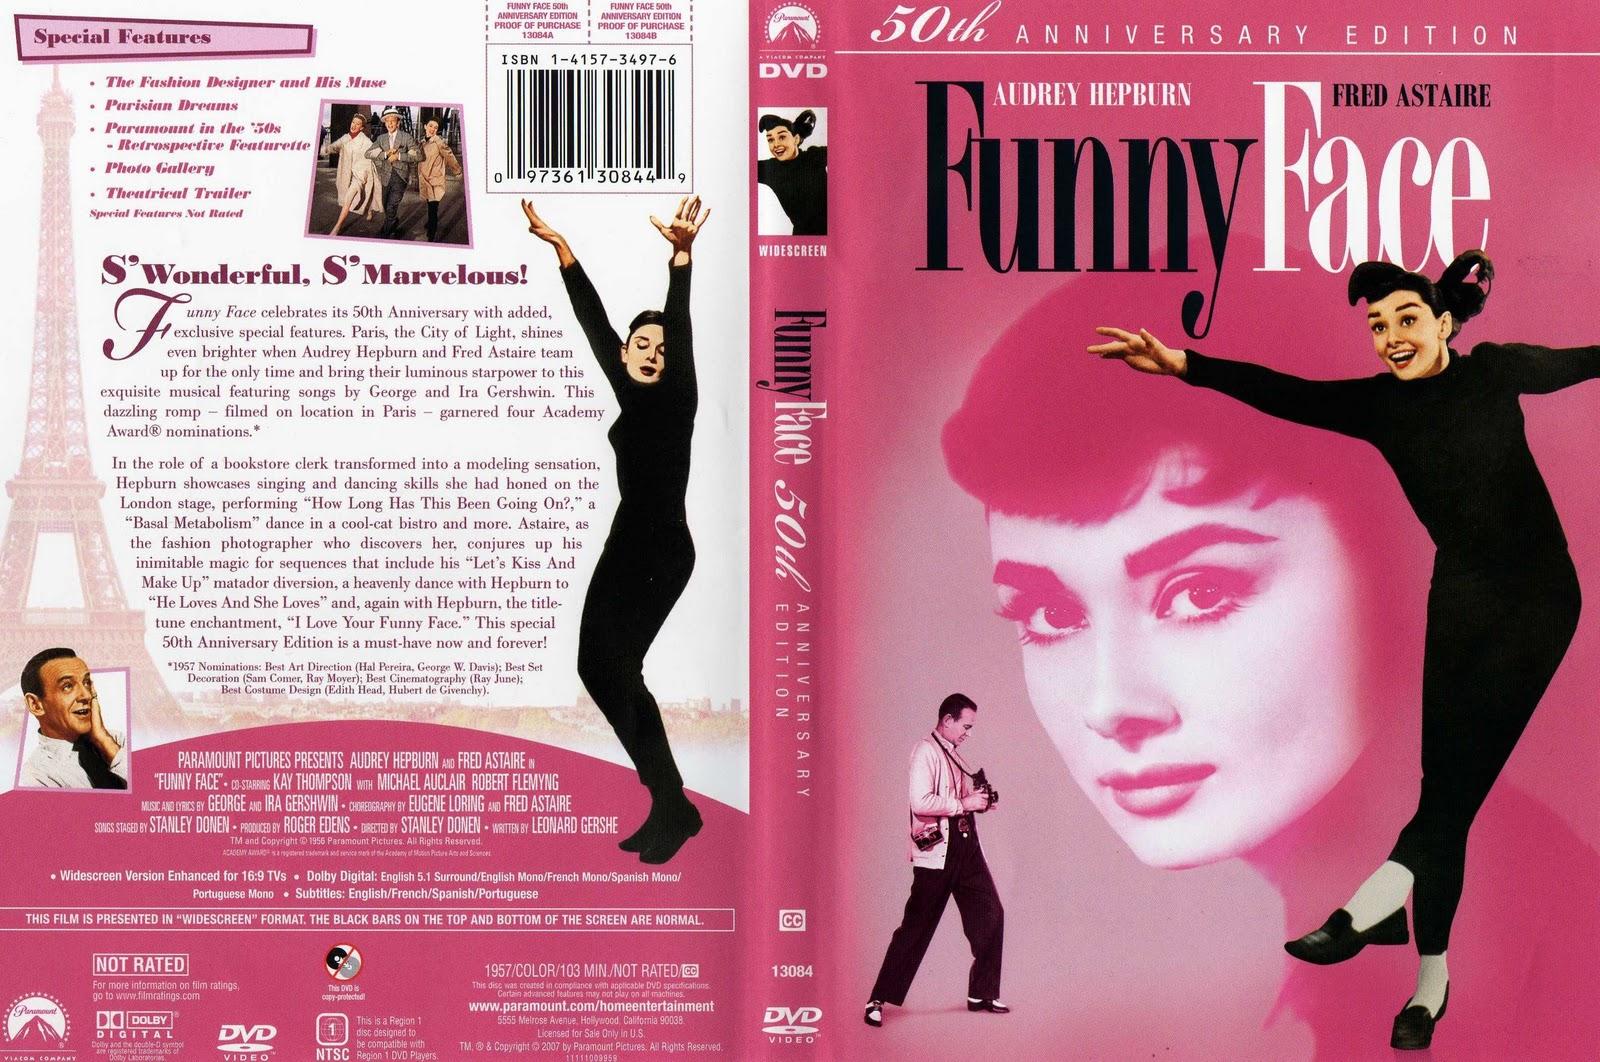 http://3.bp.blogspot.com/-uiOvPRMe3sk/TpB42CRLiXI/AAAAAAAAAhM/TvI7HOI76ew/s1600/funny_face_50th_anniversary_edition_r1-cdcovers_cc-front.jpg